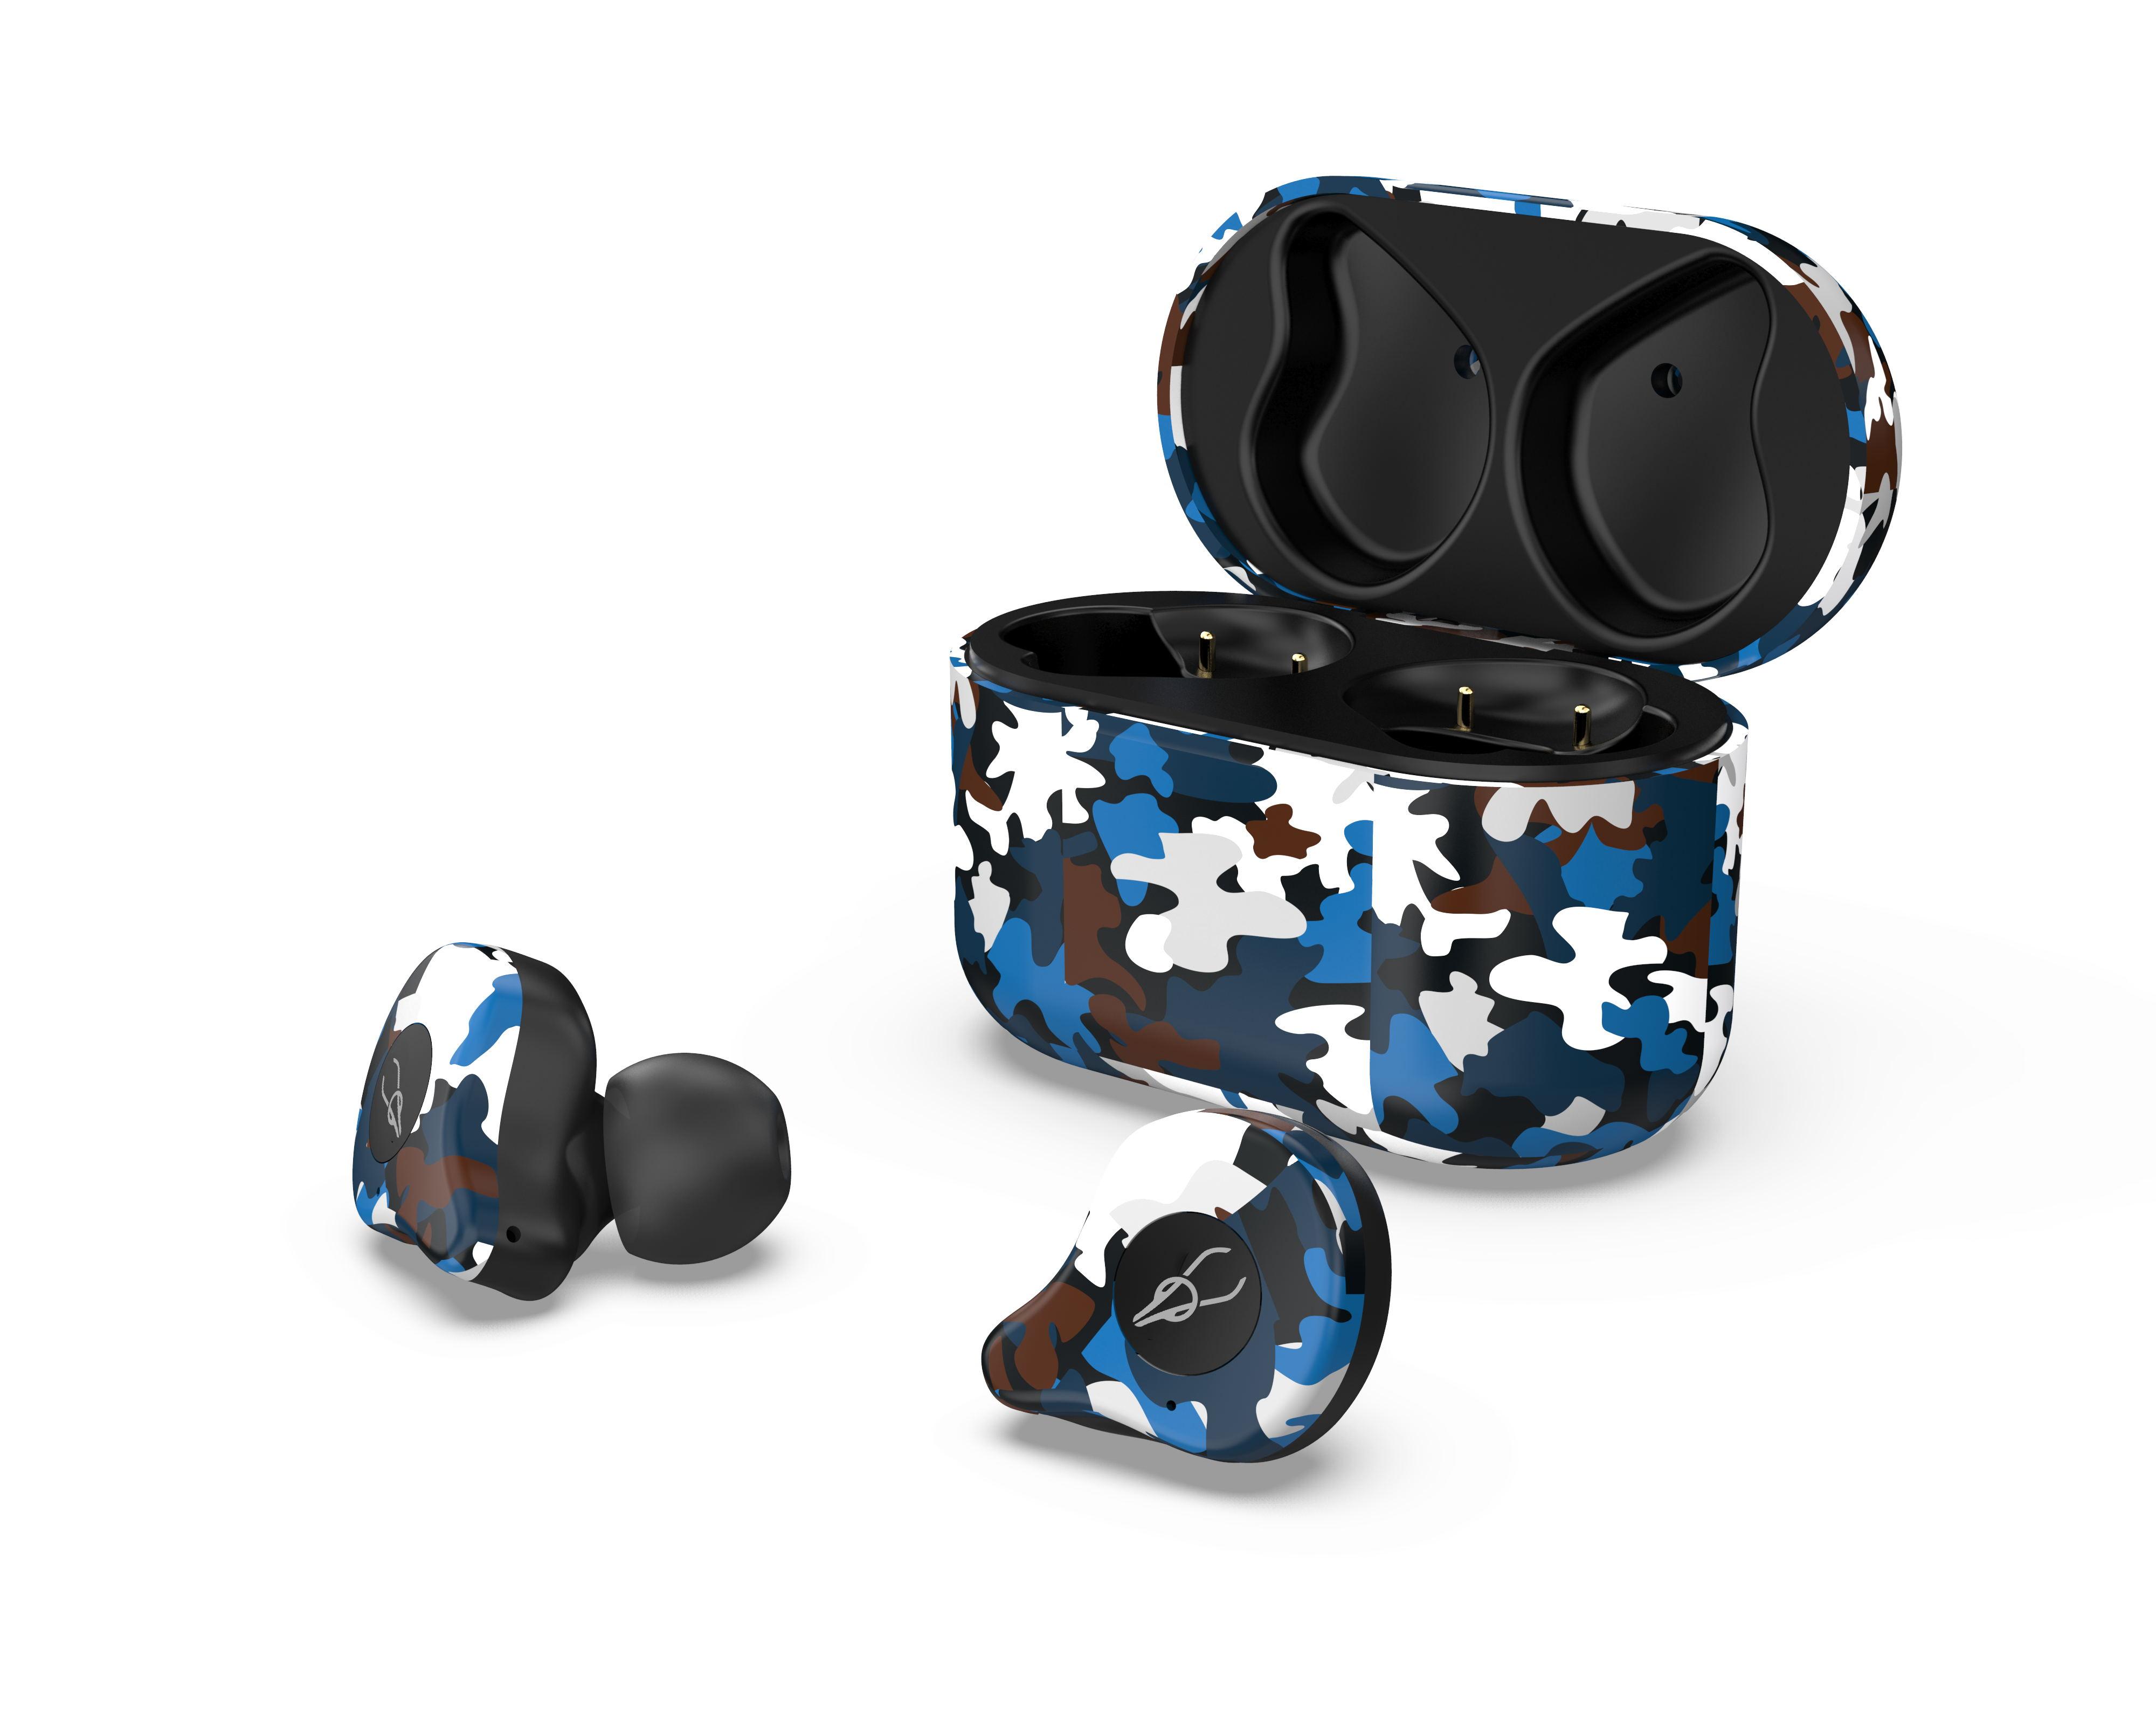 Sabbat E12 Ultra Camouflage TWS Bluetooth 5.0 Earphone Stereo Wireless Sport Earbuds Caribbean